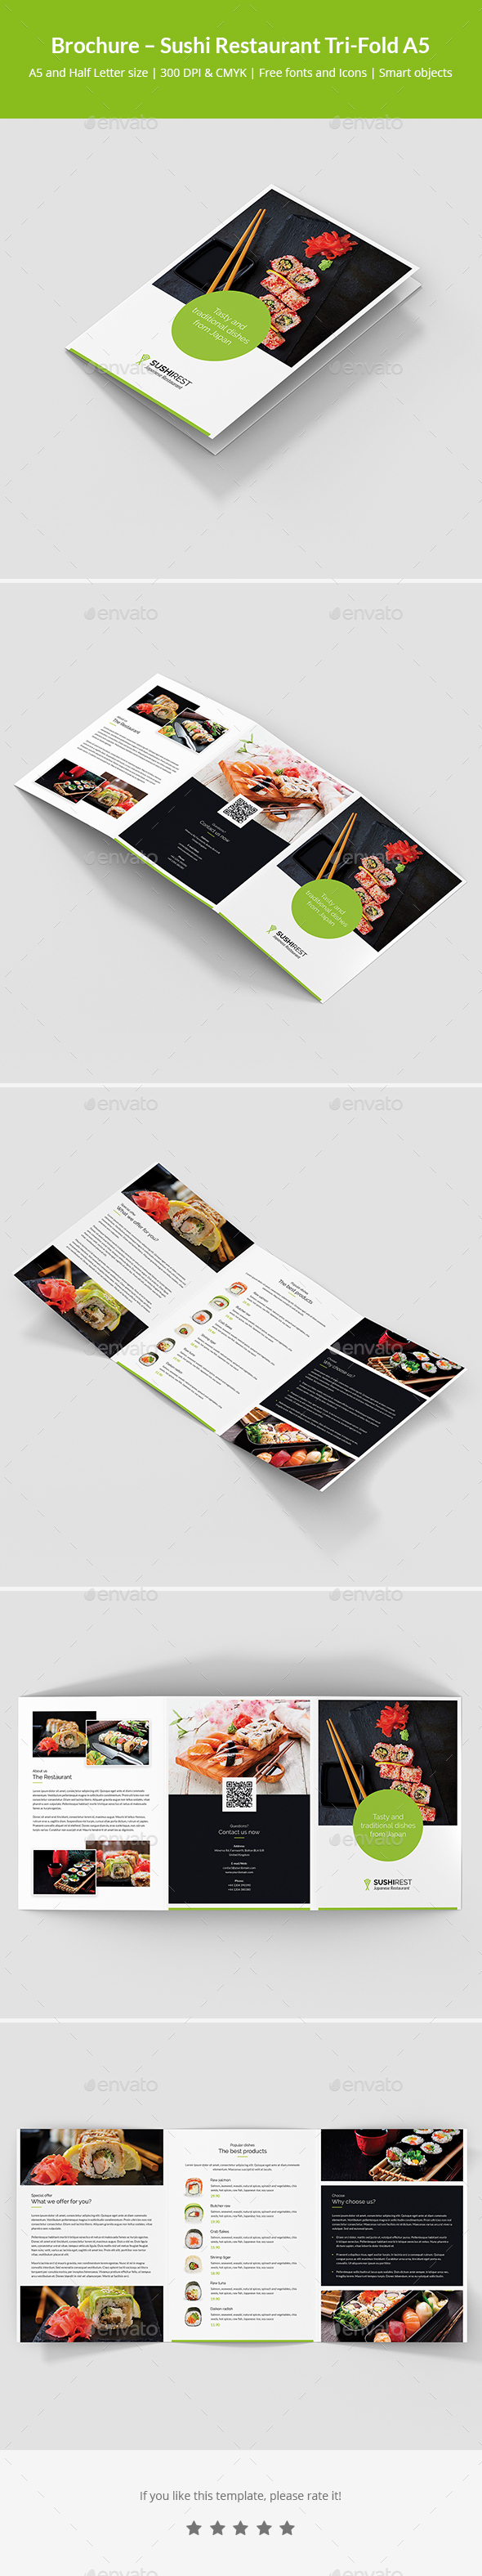 Brochure – Sushi Restaurant Tri-Fold A5 - Informational Brochures